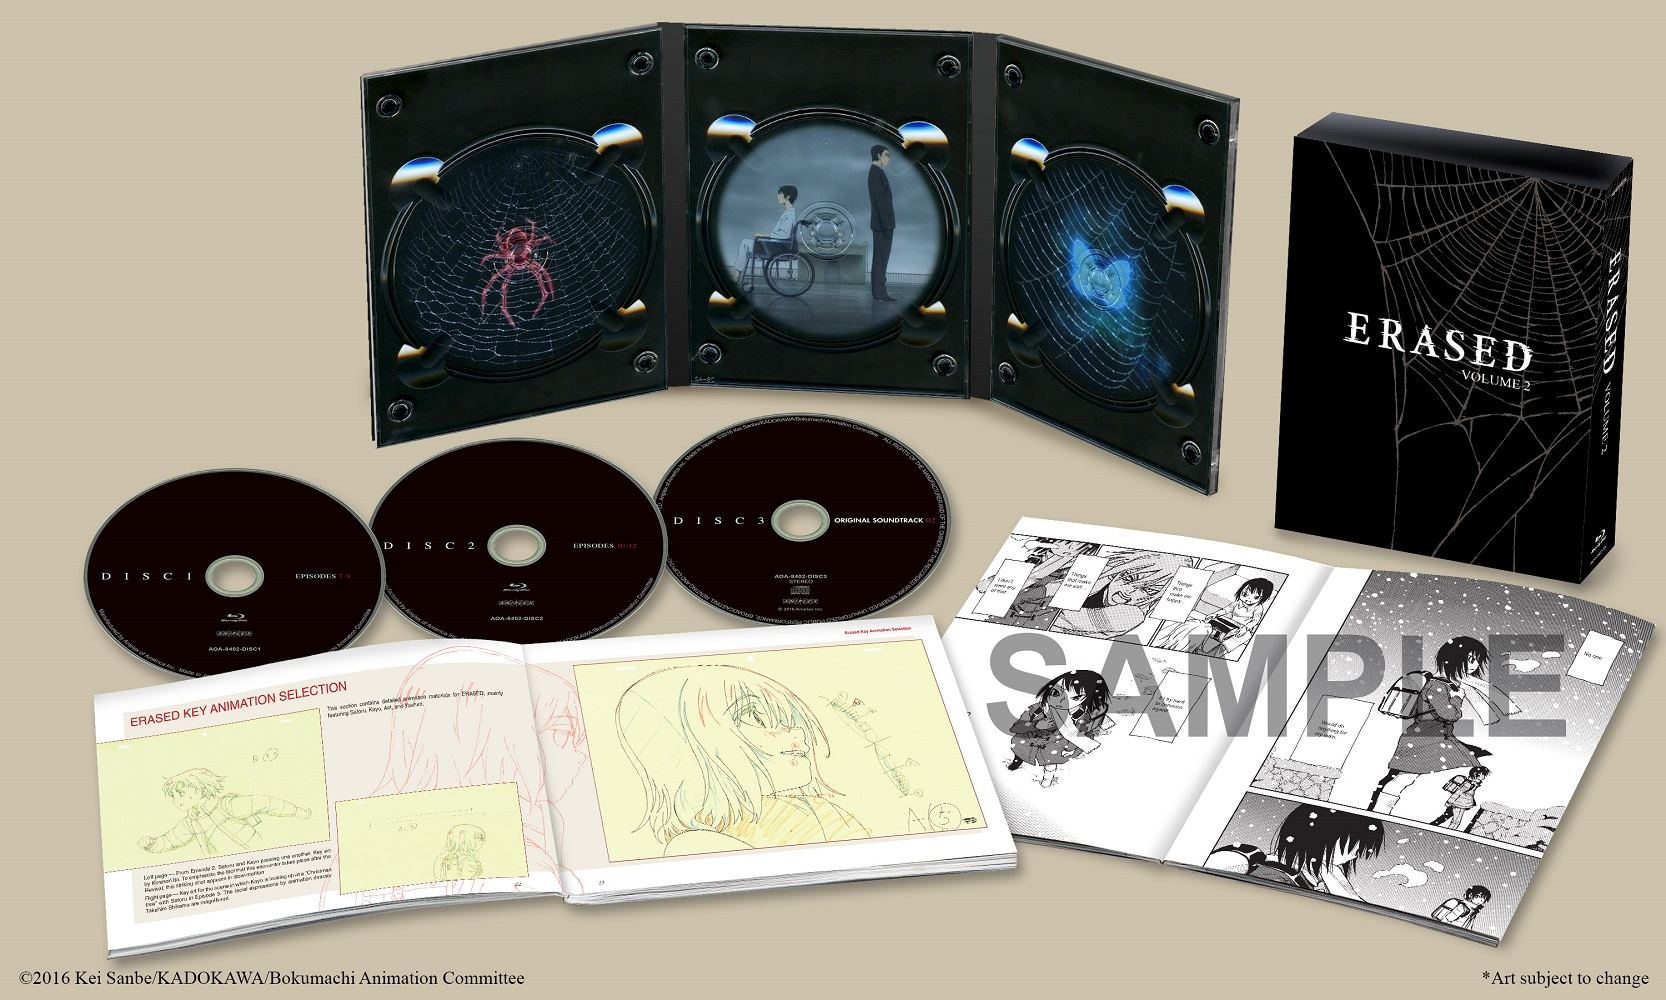 Erased Volume 2 Blu-ray